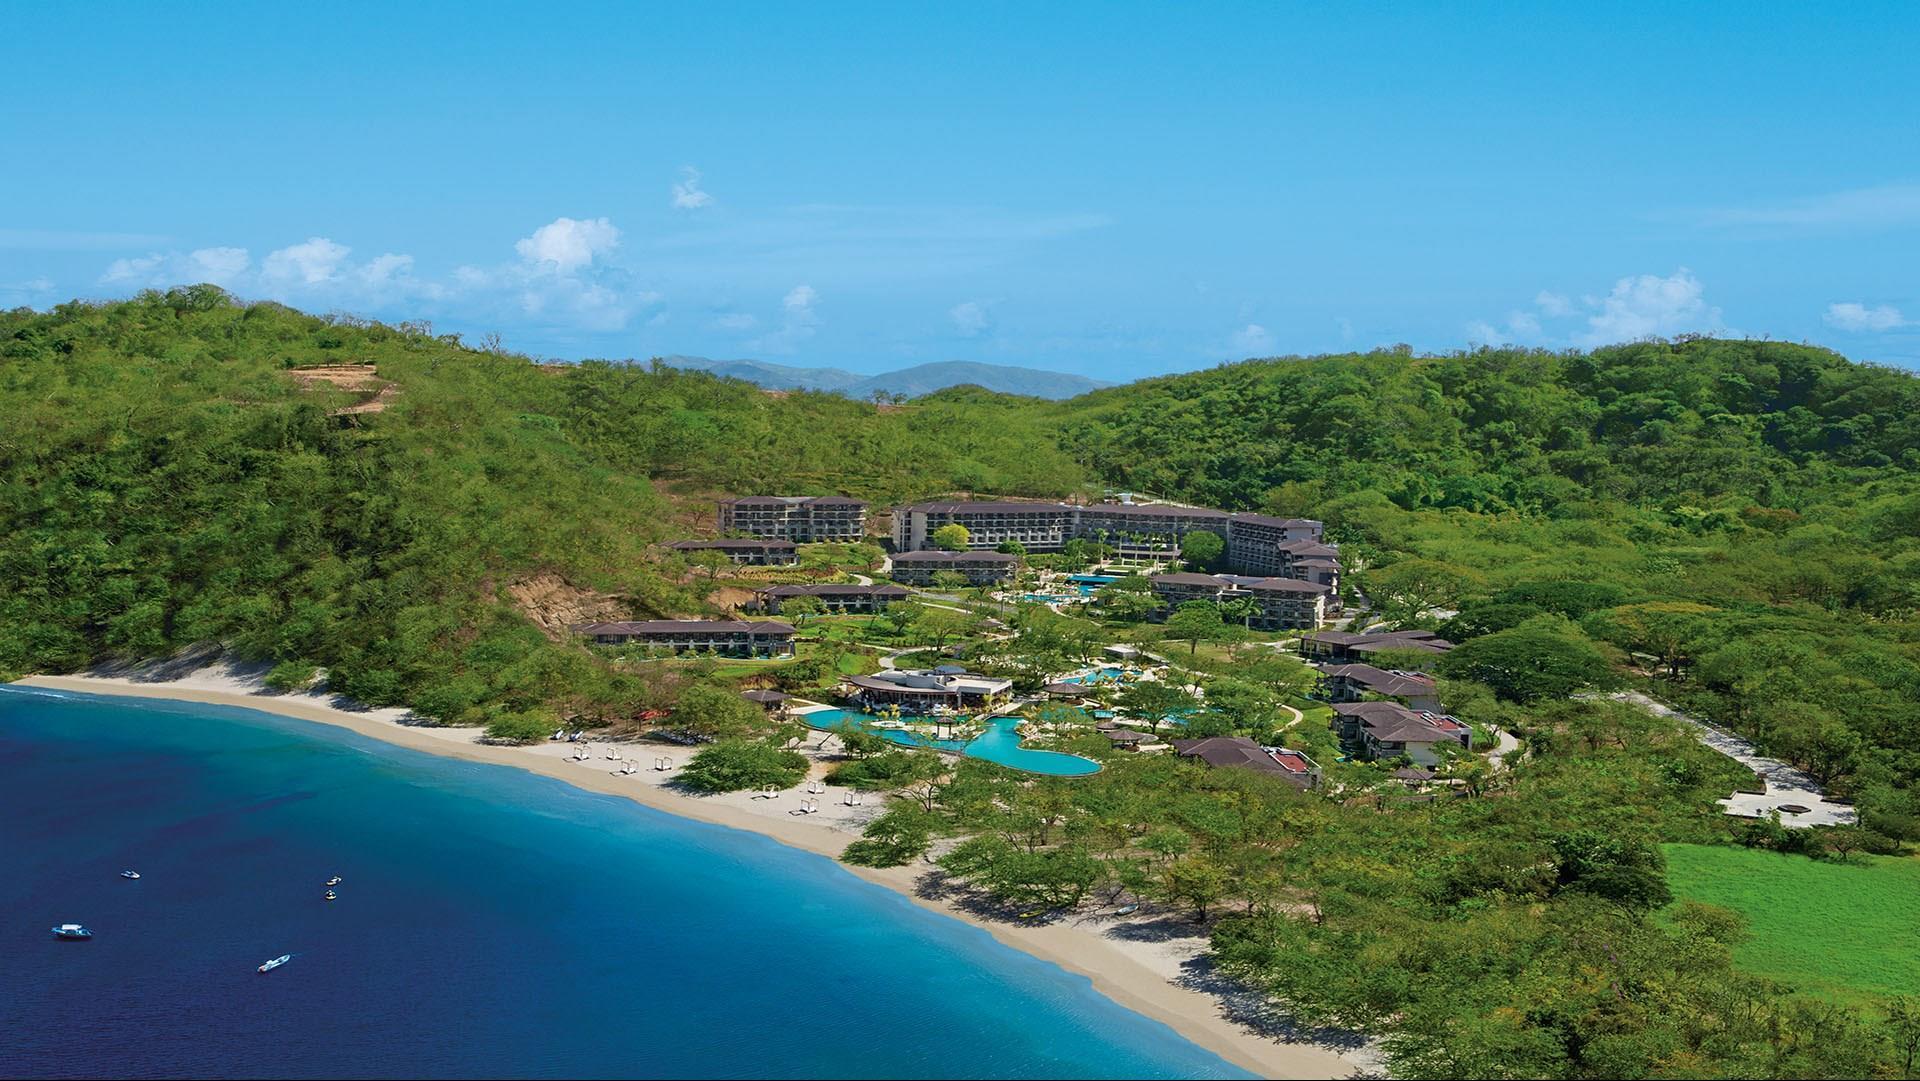 Meetings And Events At Dreams Las Mareas Costa Rica Guanacaste CR